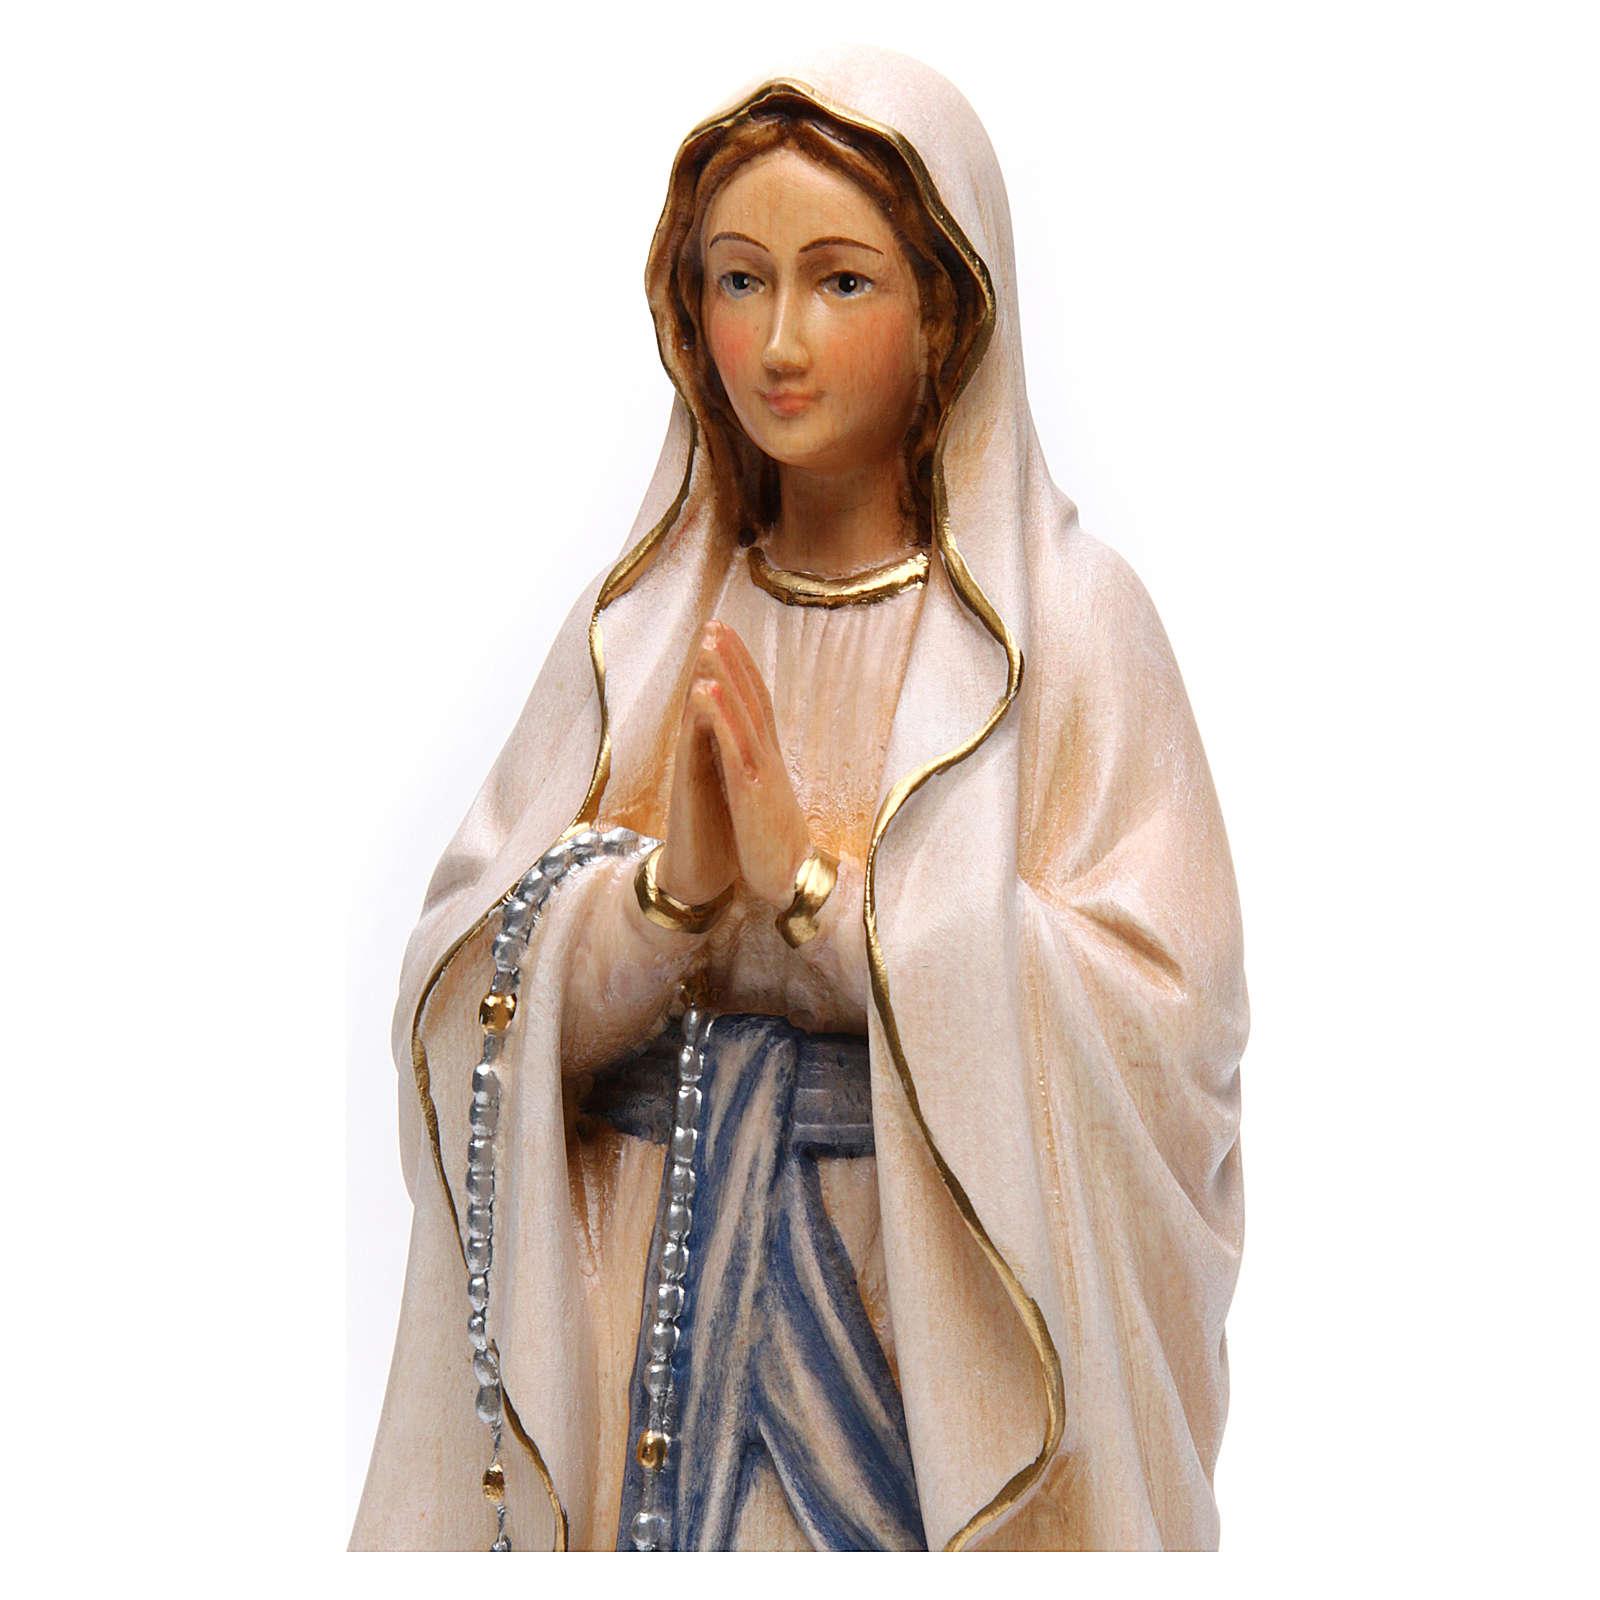 Grödnertal Holzschnitzerei Madonna Lourdes 4